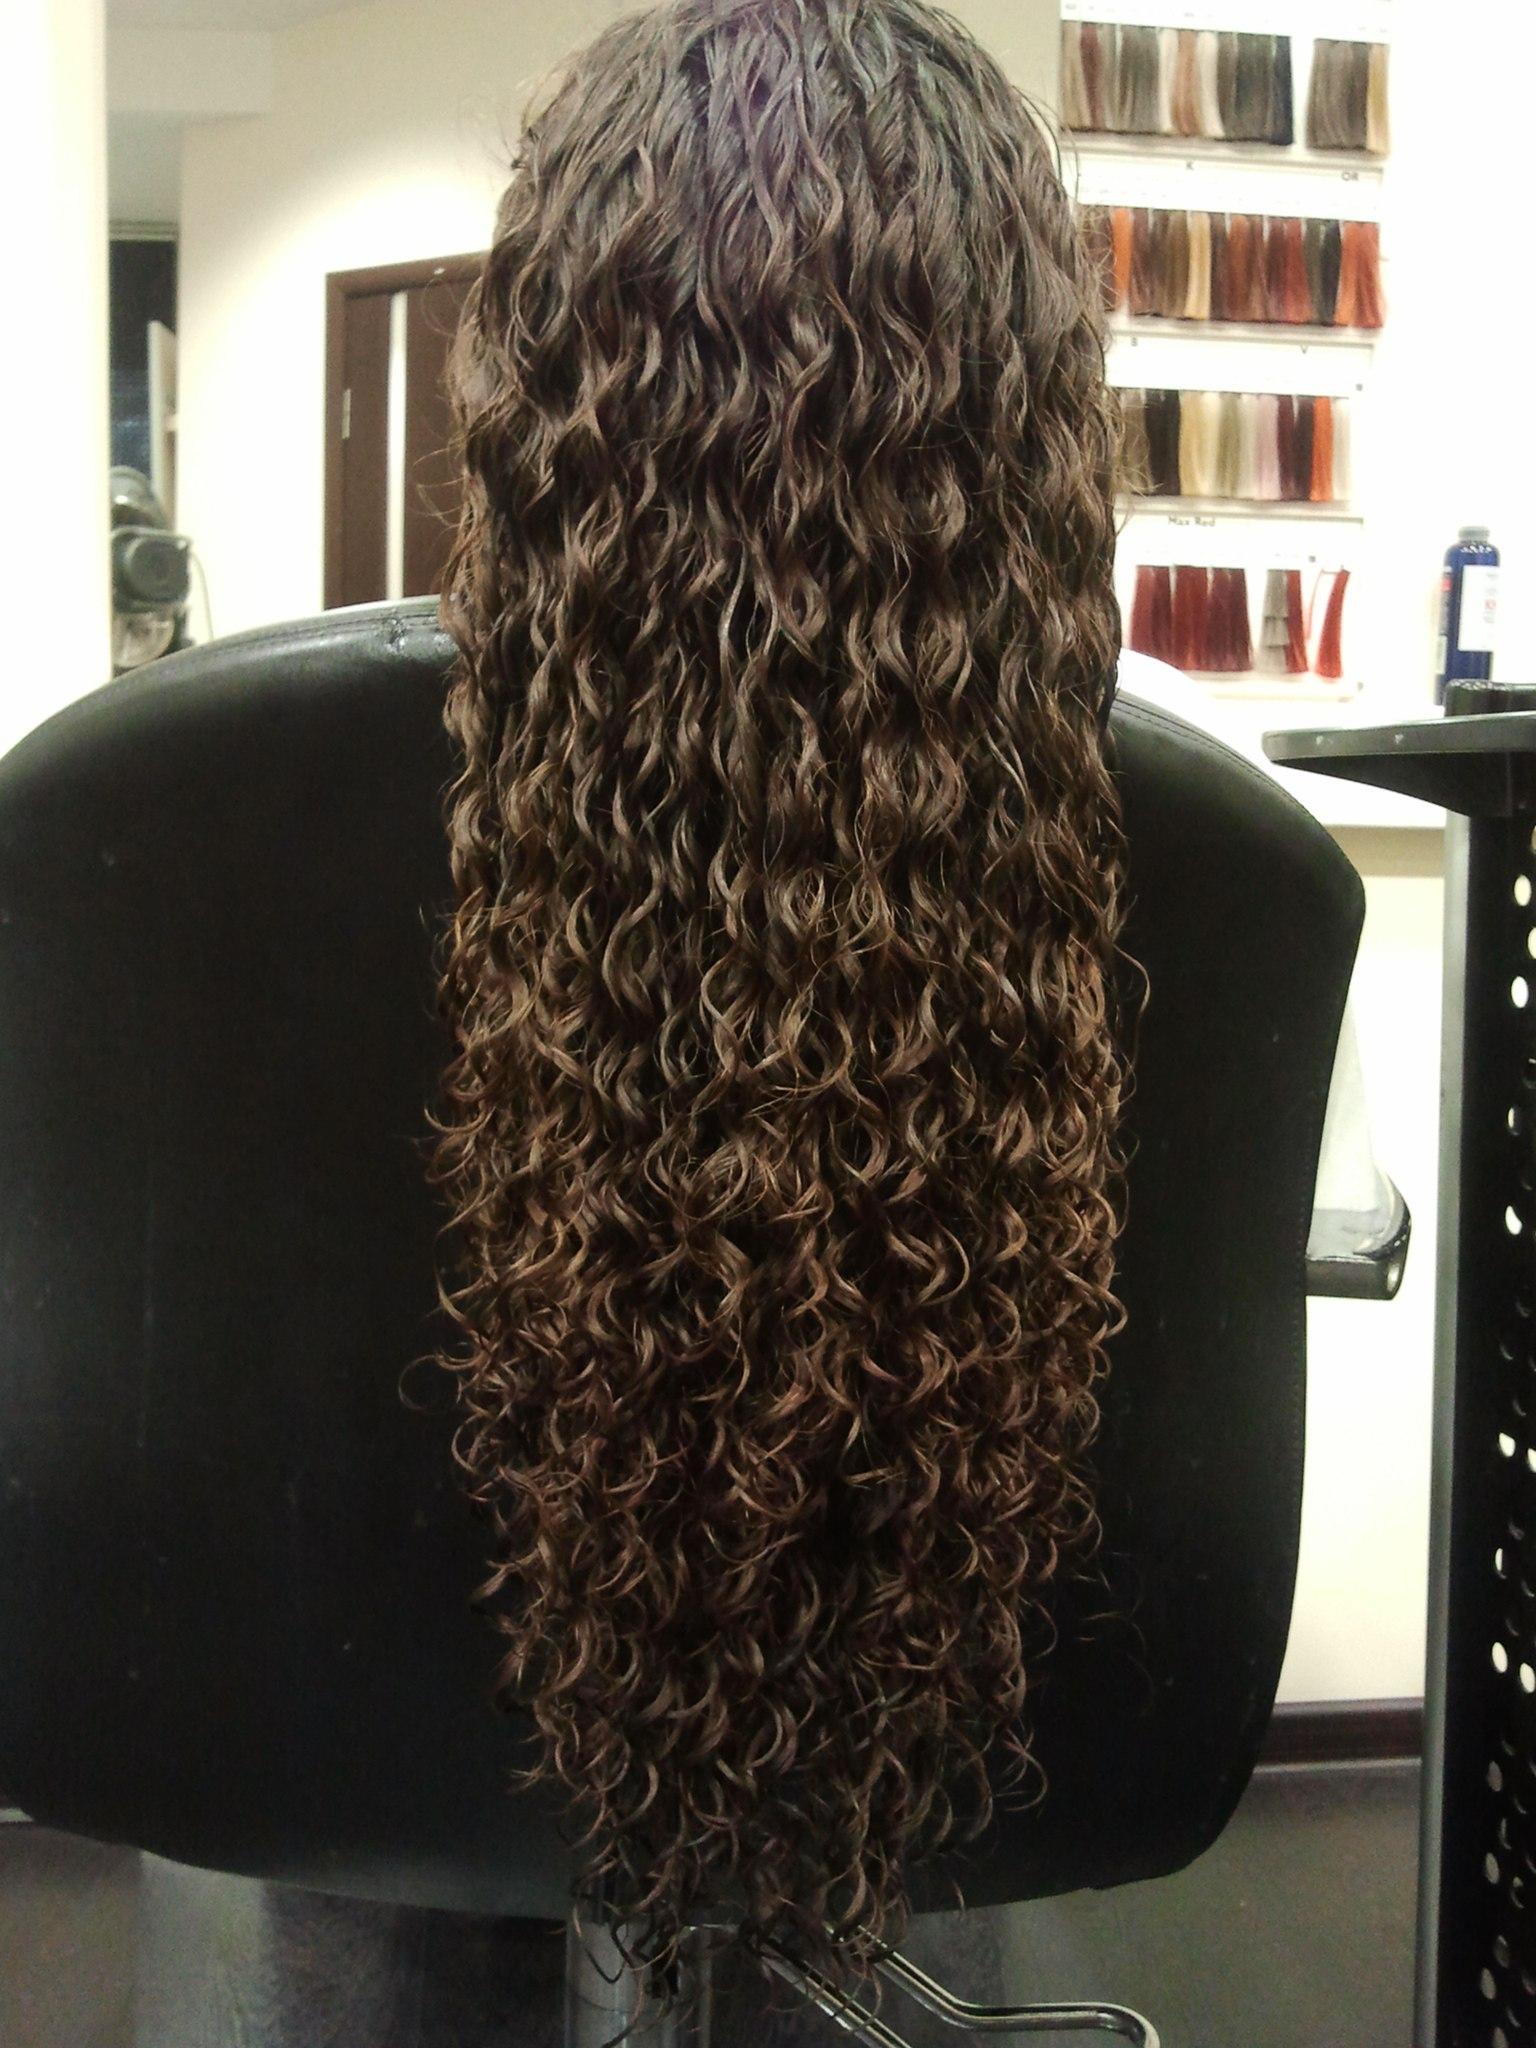 Long Hair Tight Curls Spiral Perm 10011011110010110100 Tags | Male ...